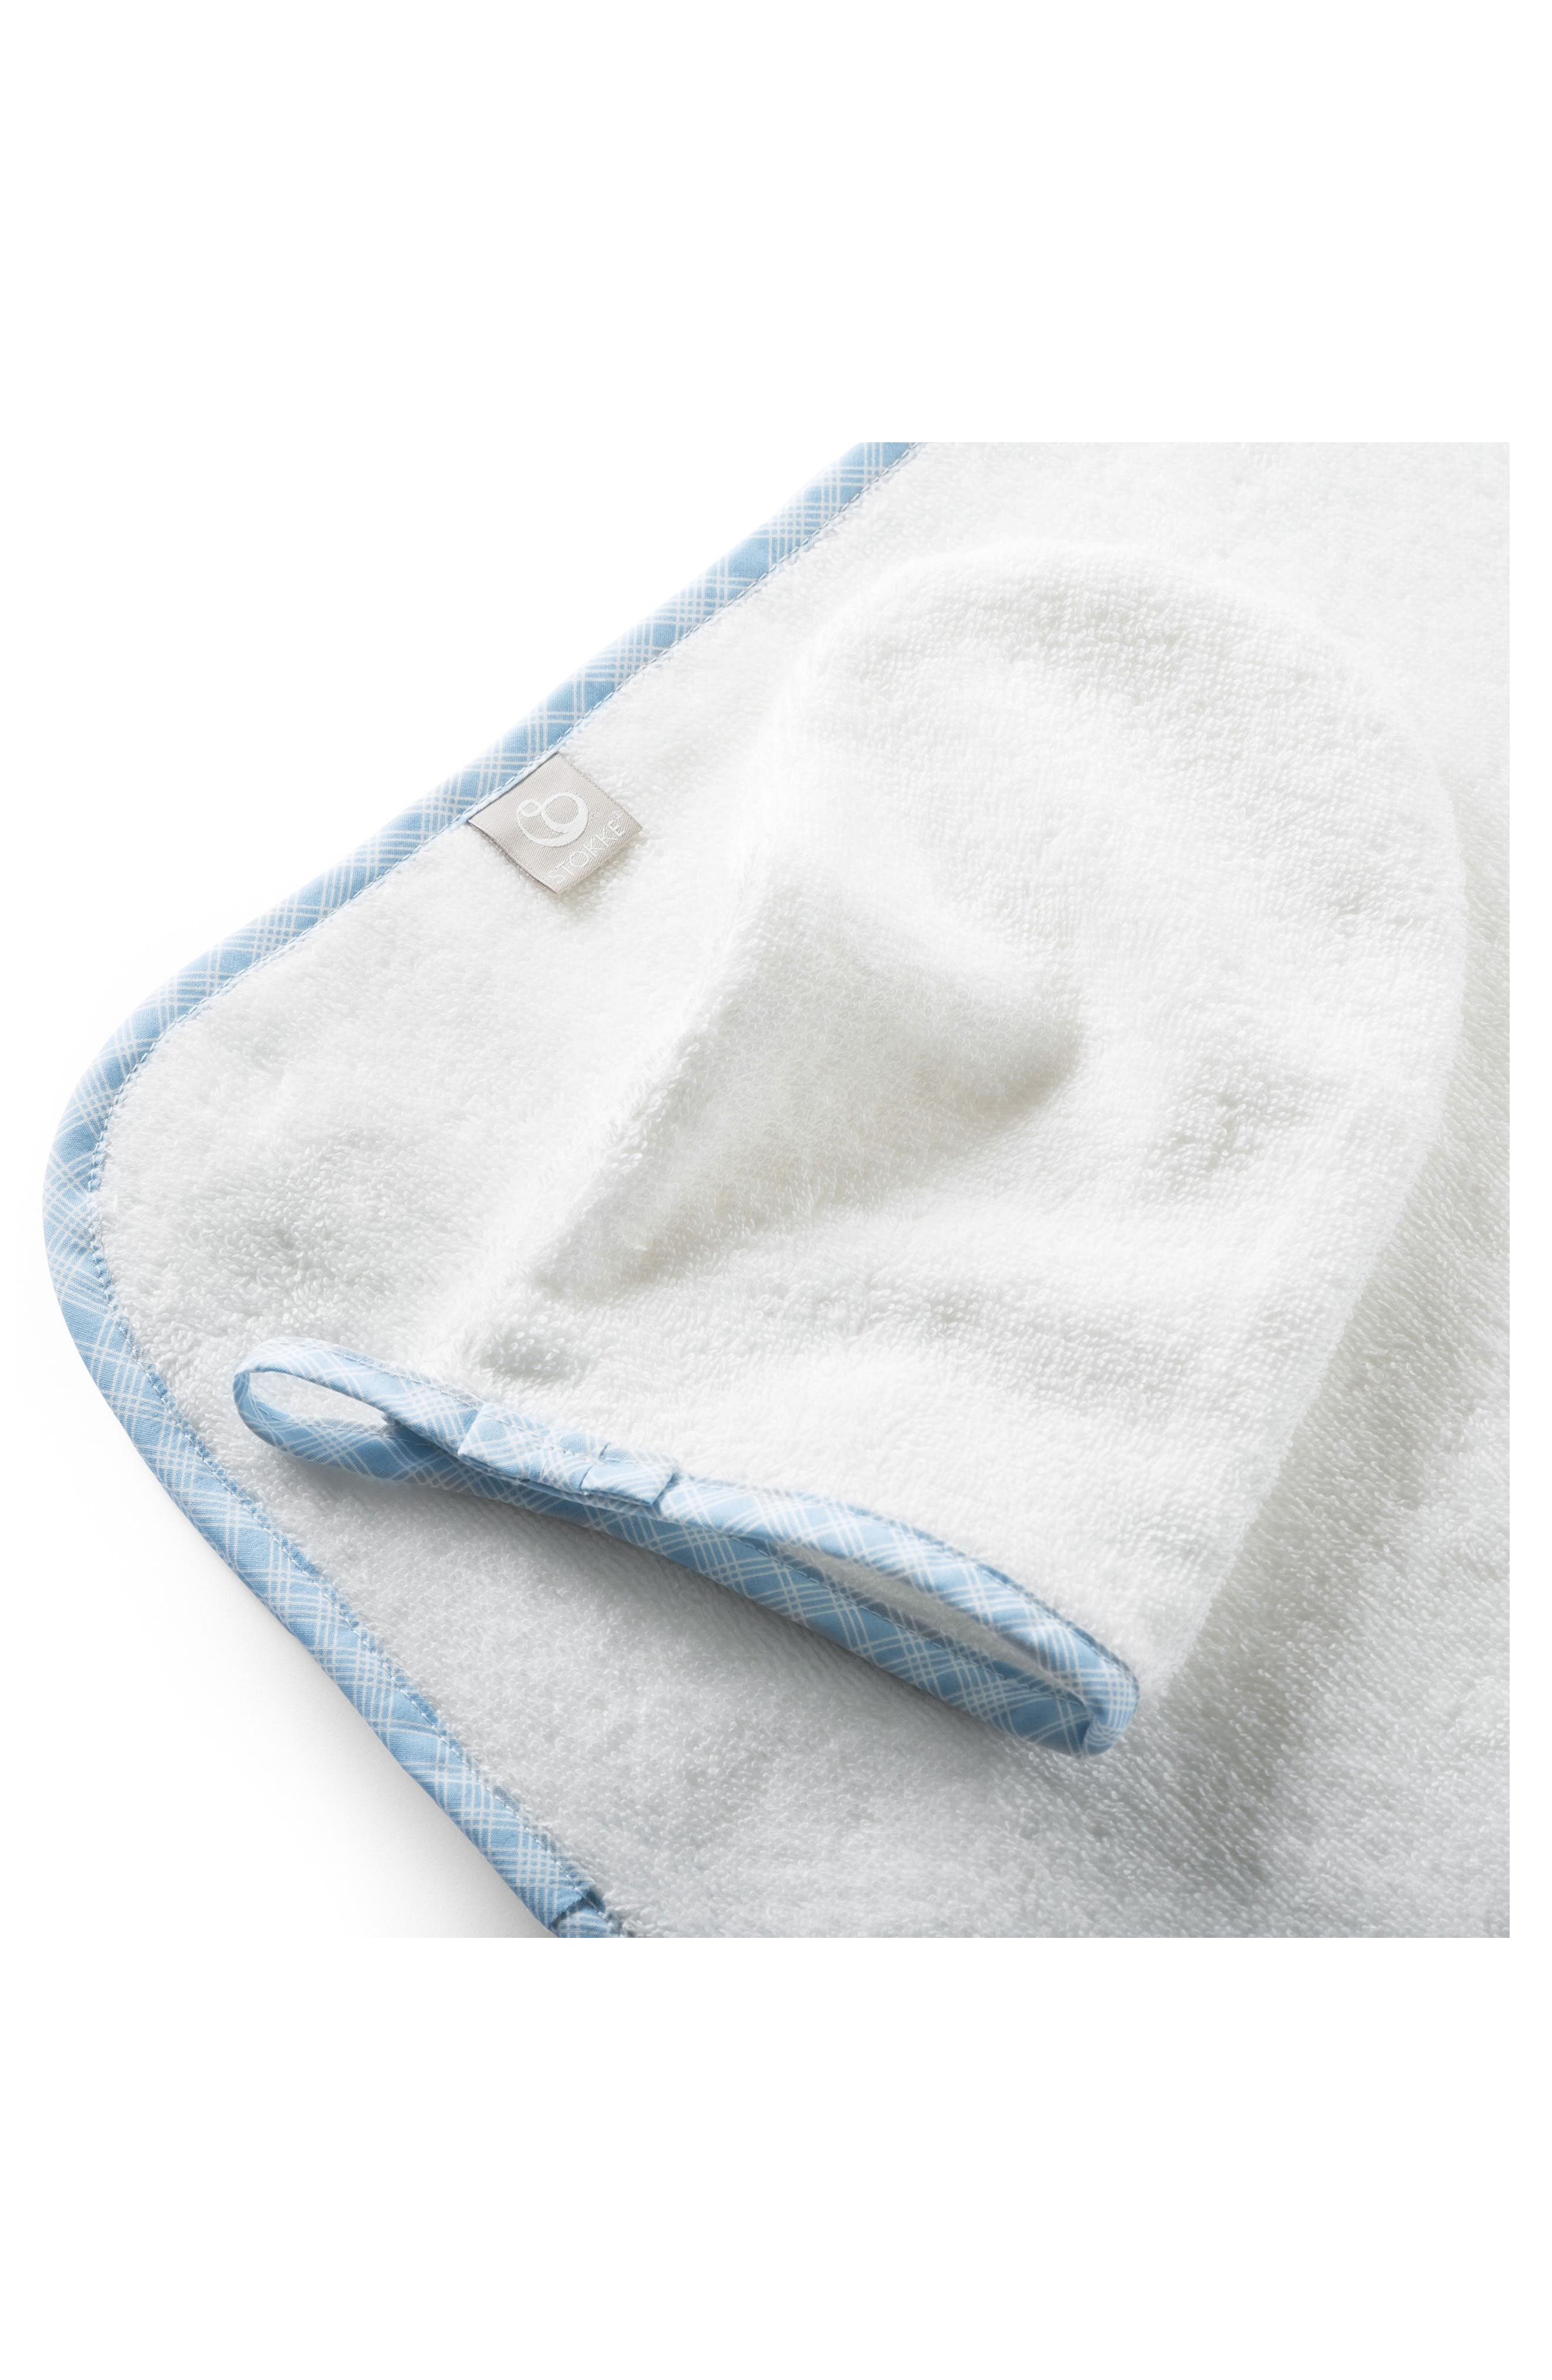 Hooded Towel & Bath Mitt Set,                             Alternate thumbnail 2, color,                             Blue Checks